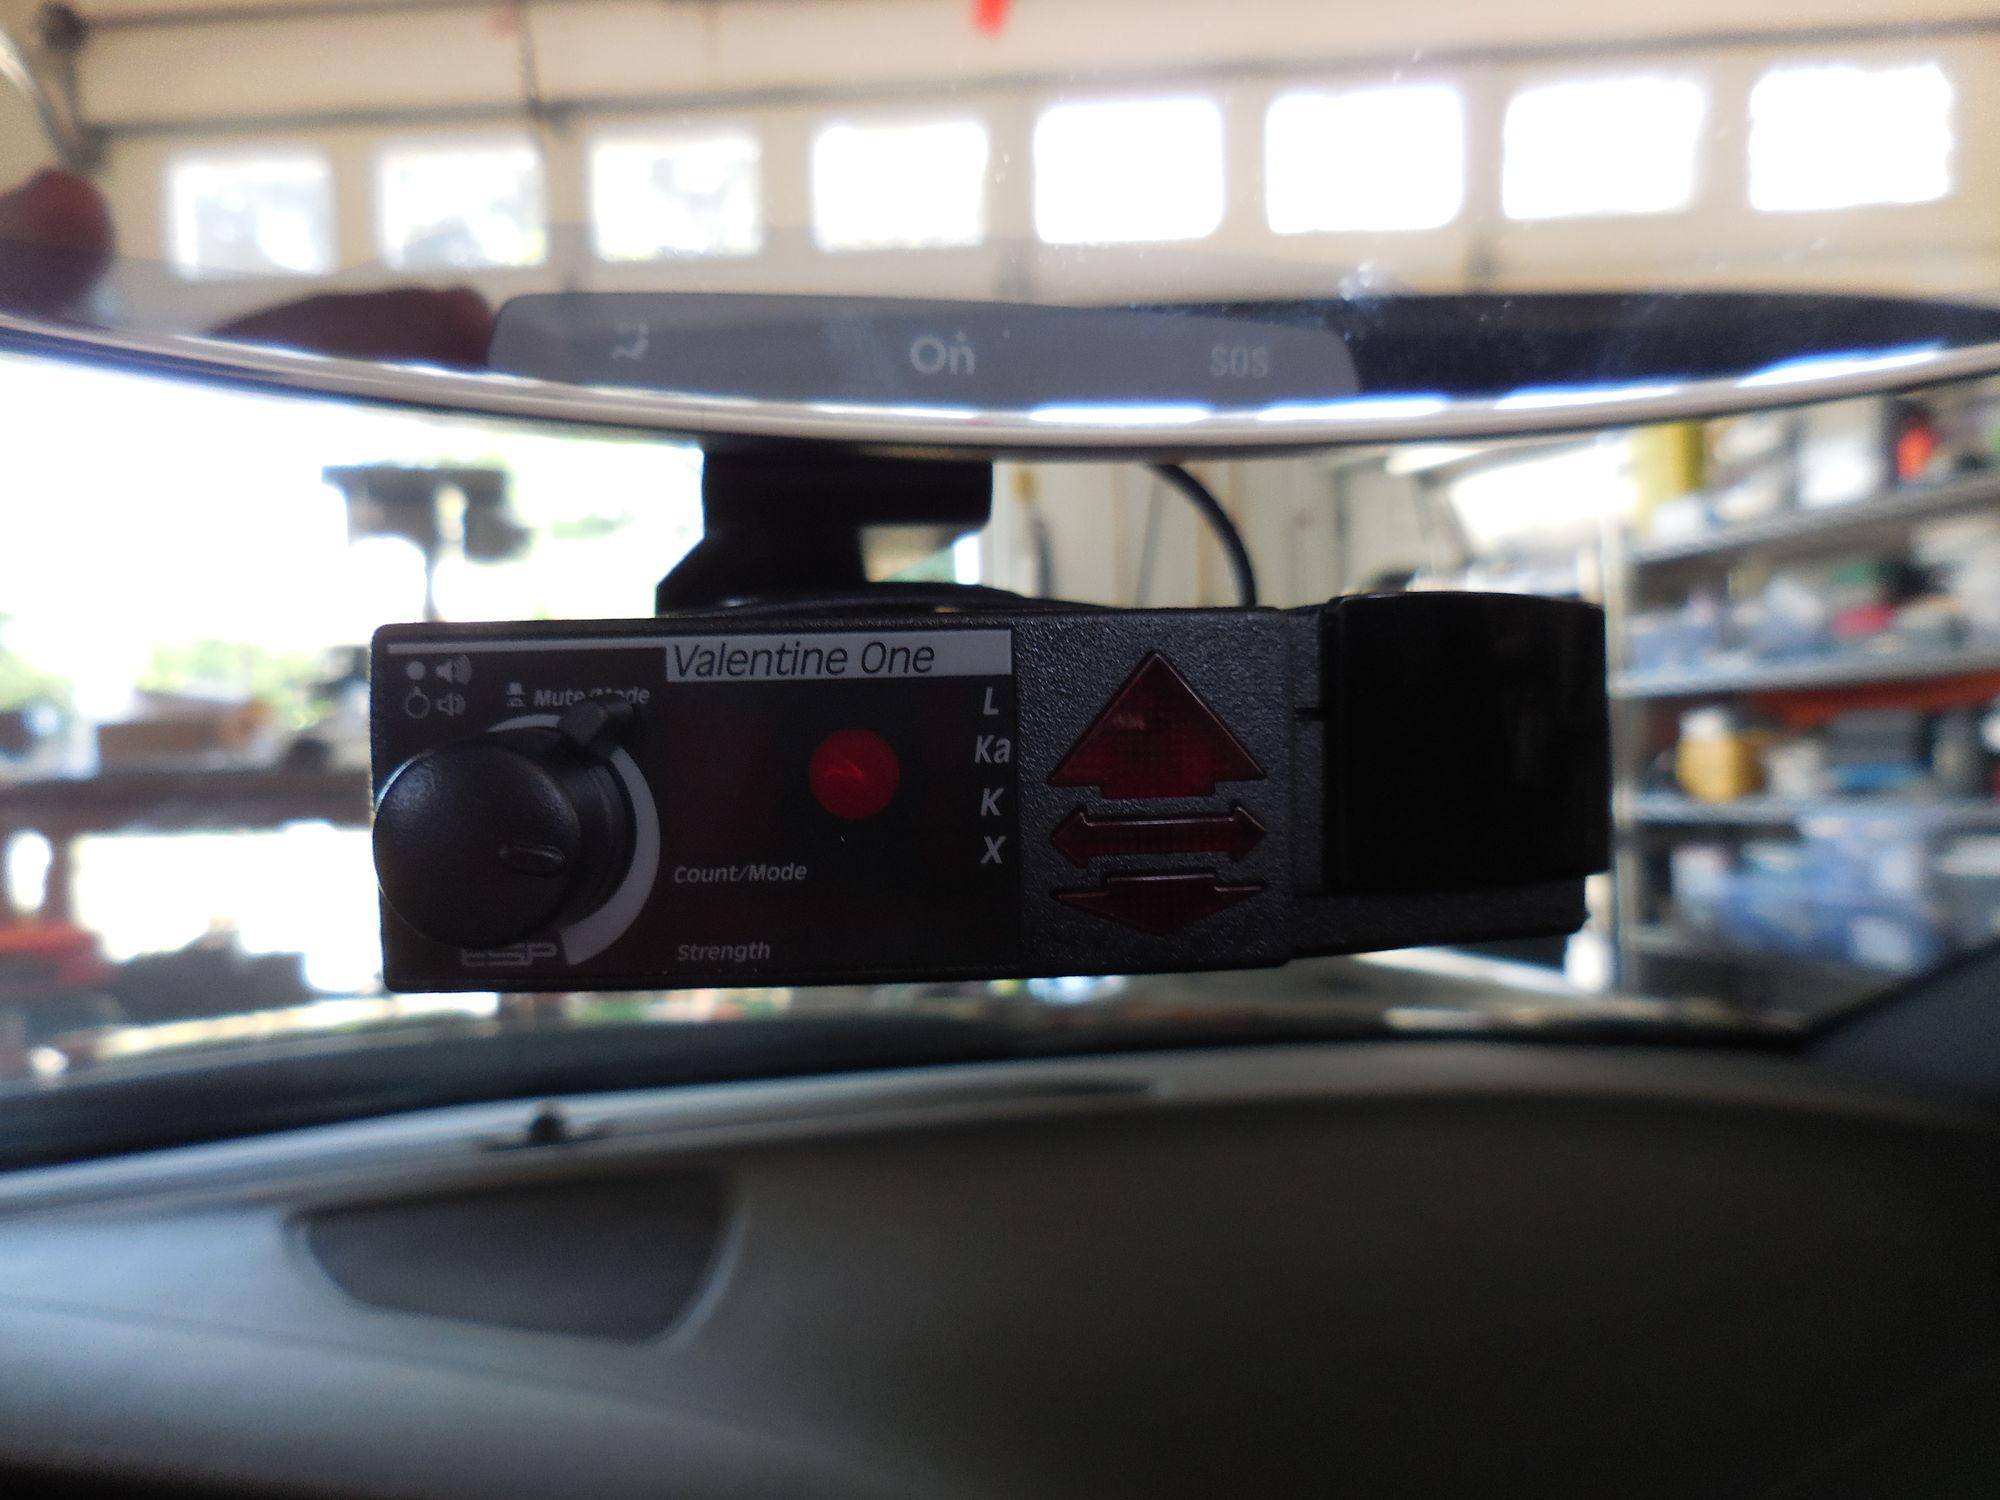 80 dscn0235_dc0b3123edd8c15ce730853805719be29f00bd71 mirror tap for radar detector for '15 z51 page 7 corvetteforum BlendMount Radar Detector Mount at creativeand.co